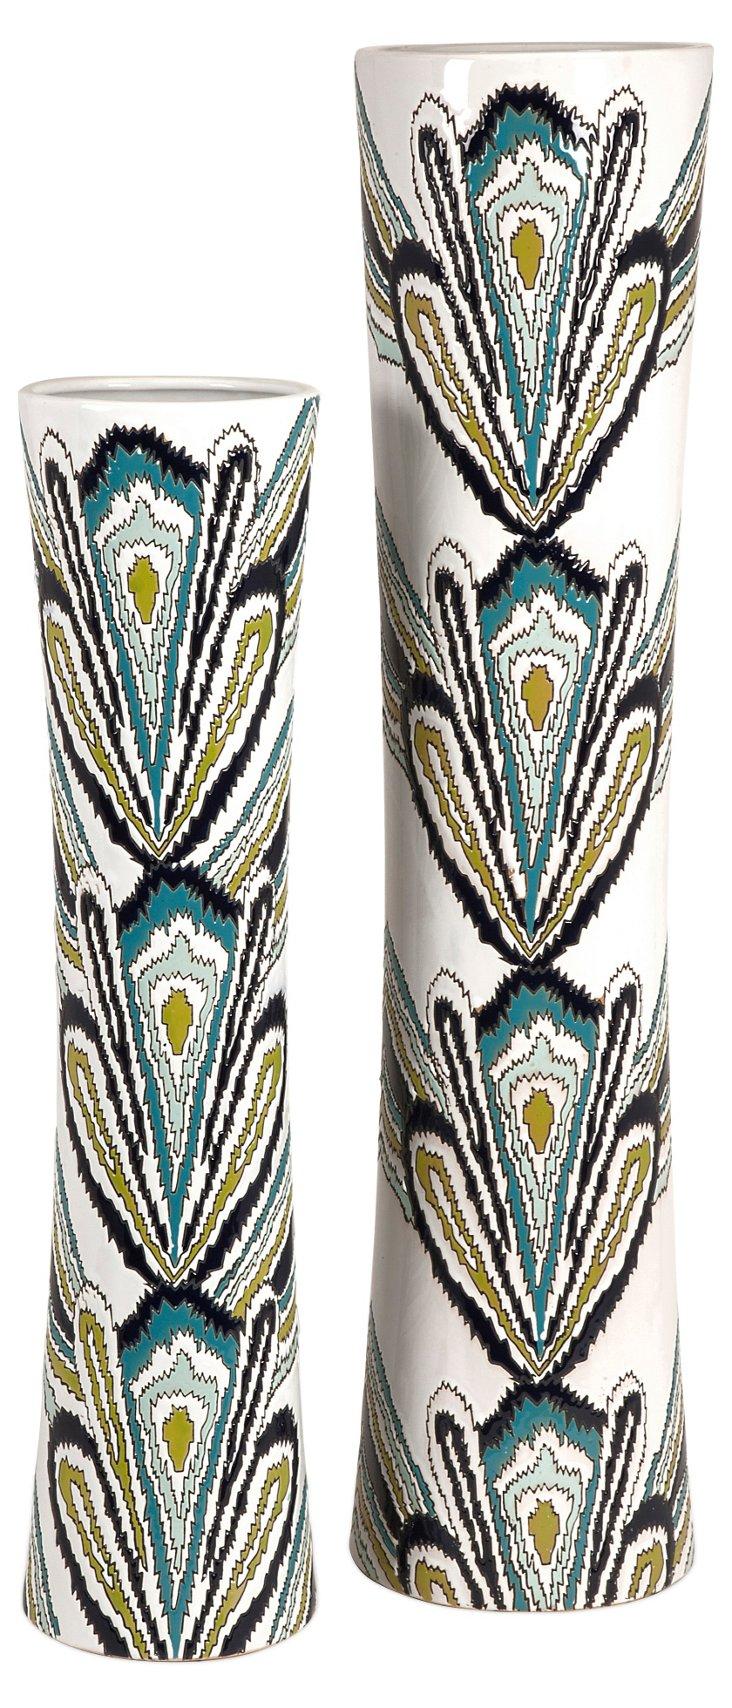 Asst. of 2 Lamia Tapered Vases, Multi